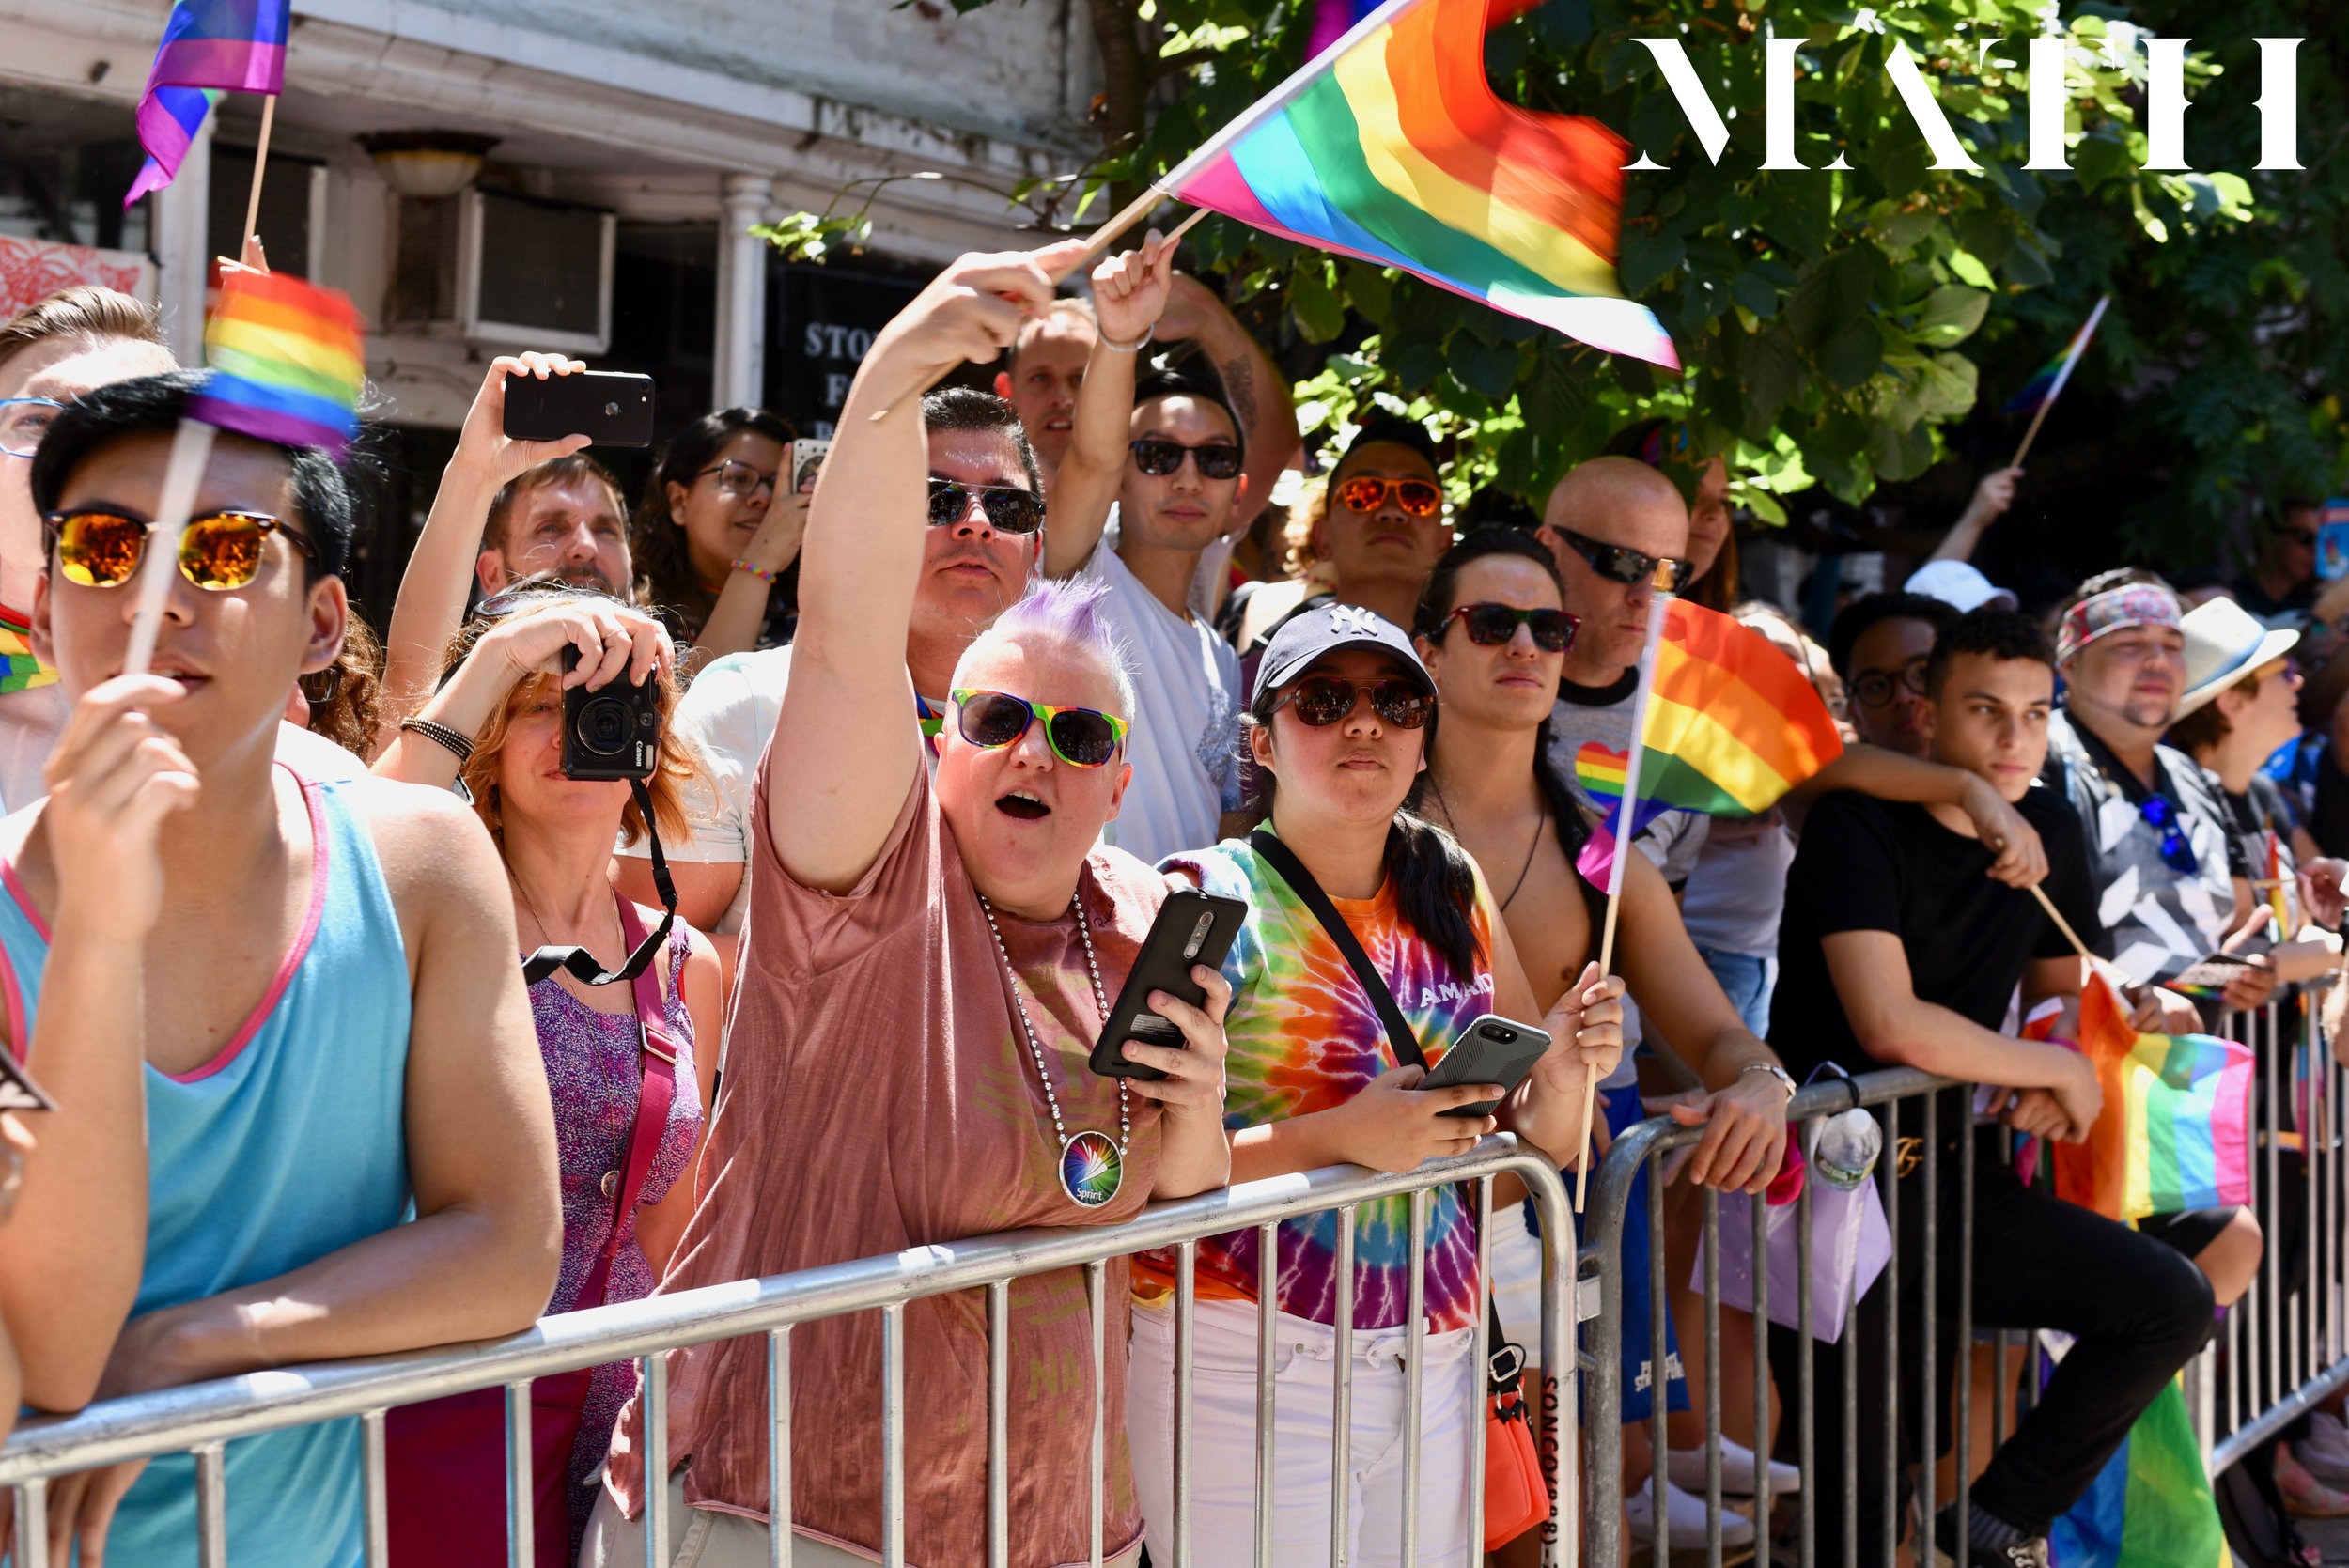 NYC Pride_Ginger Hollander 1.jpg